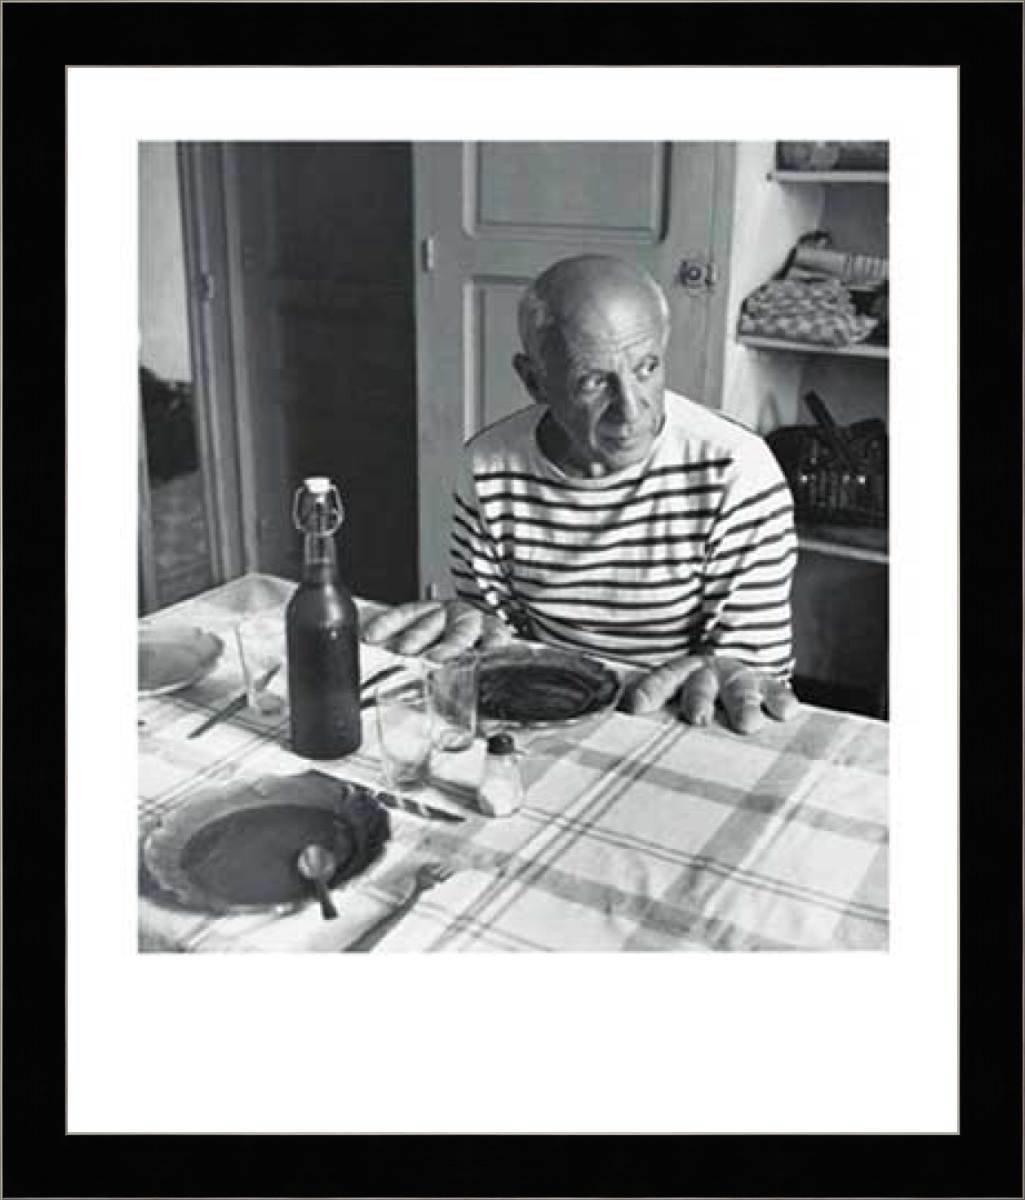 Robert Doisneau - Les Pains de Picasso Framed Art Print